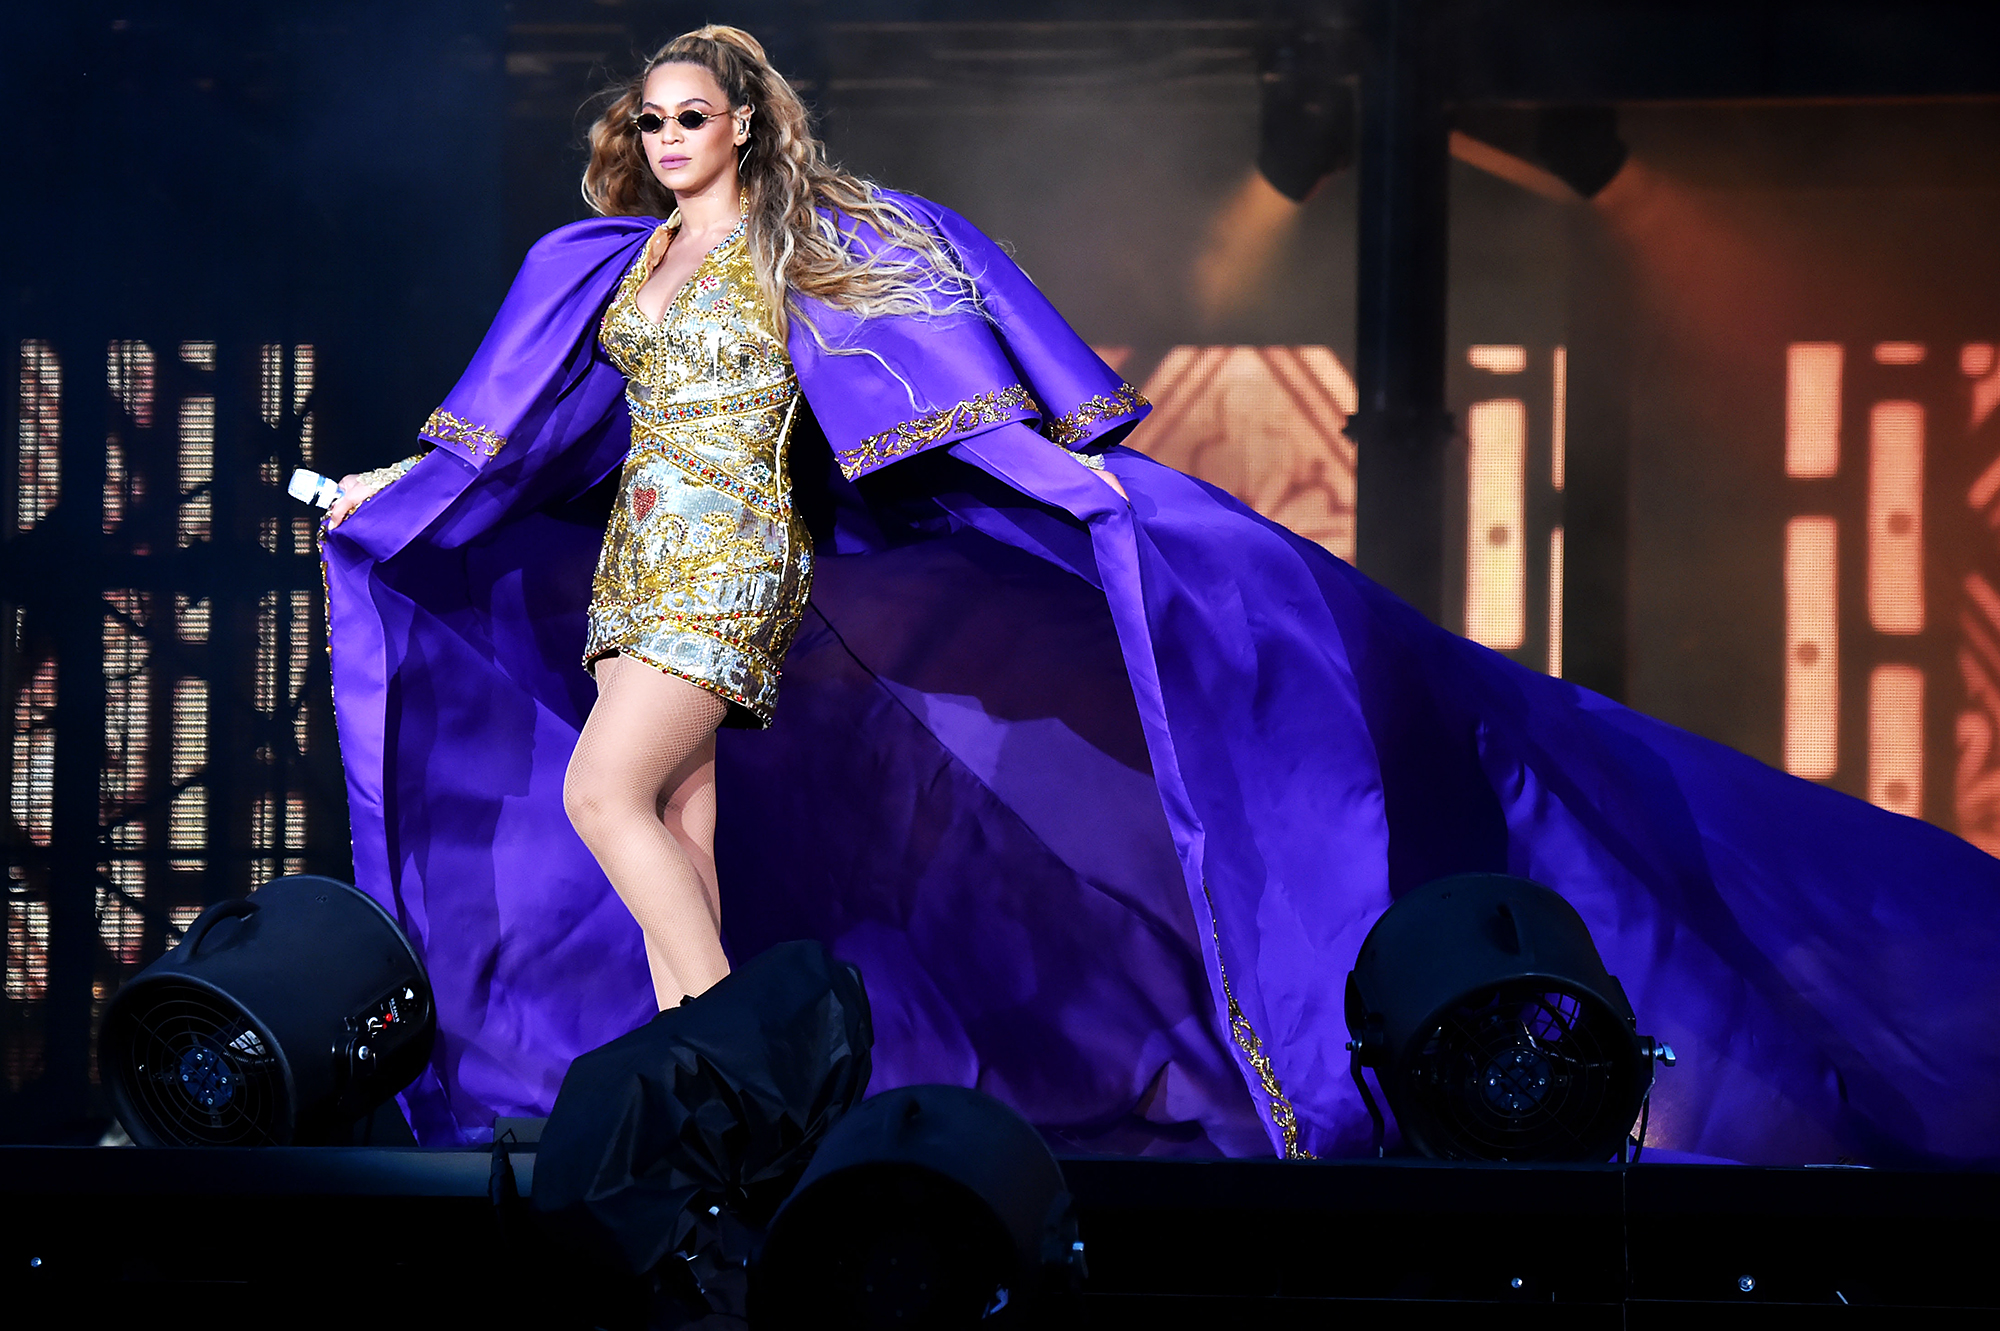 Beyonce Malfunction Emergency Ladder Concert